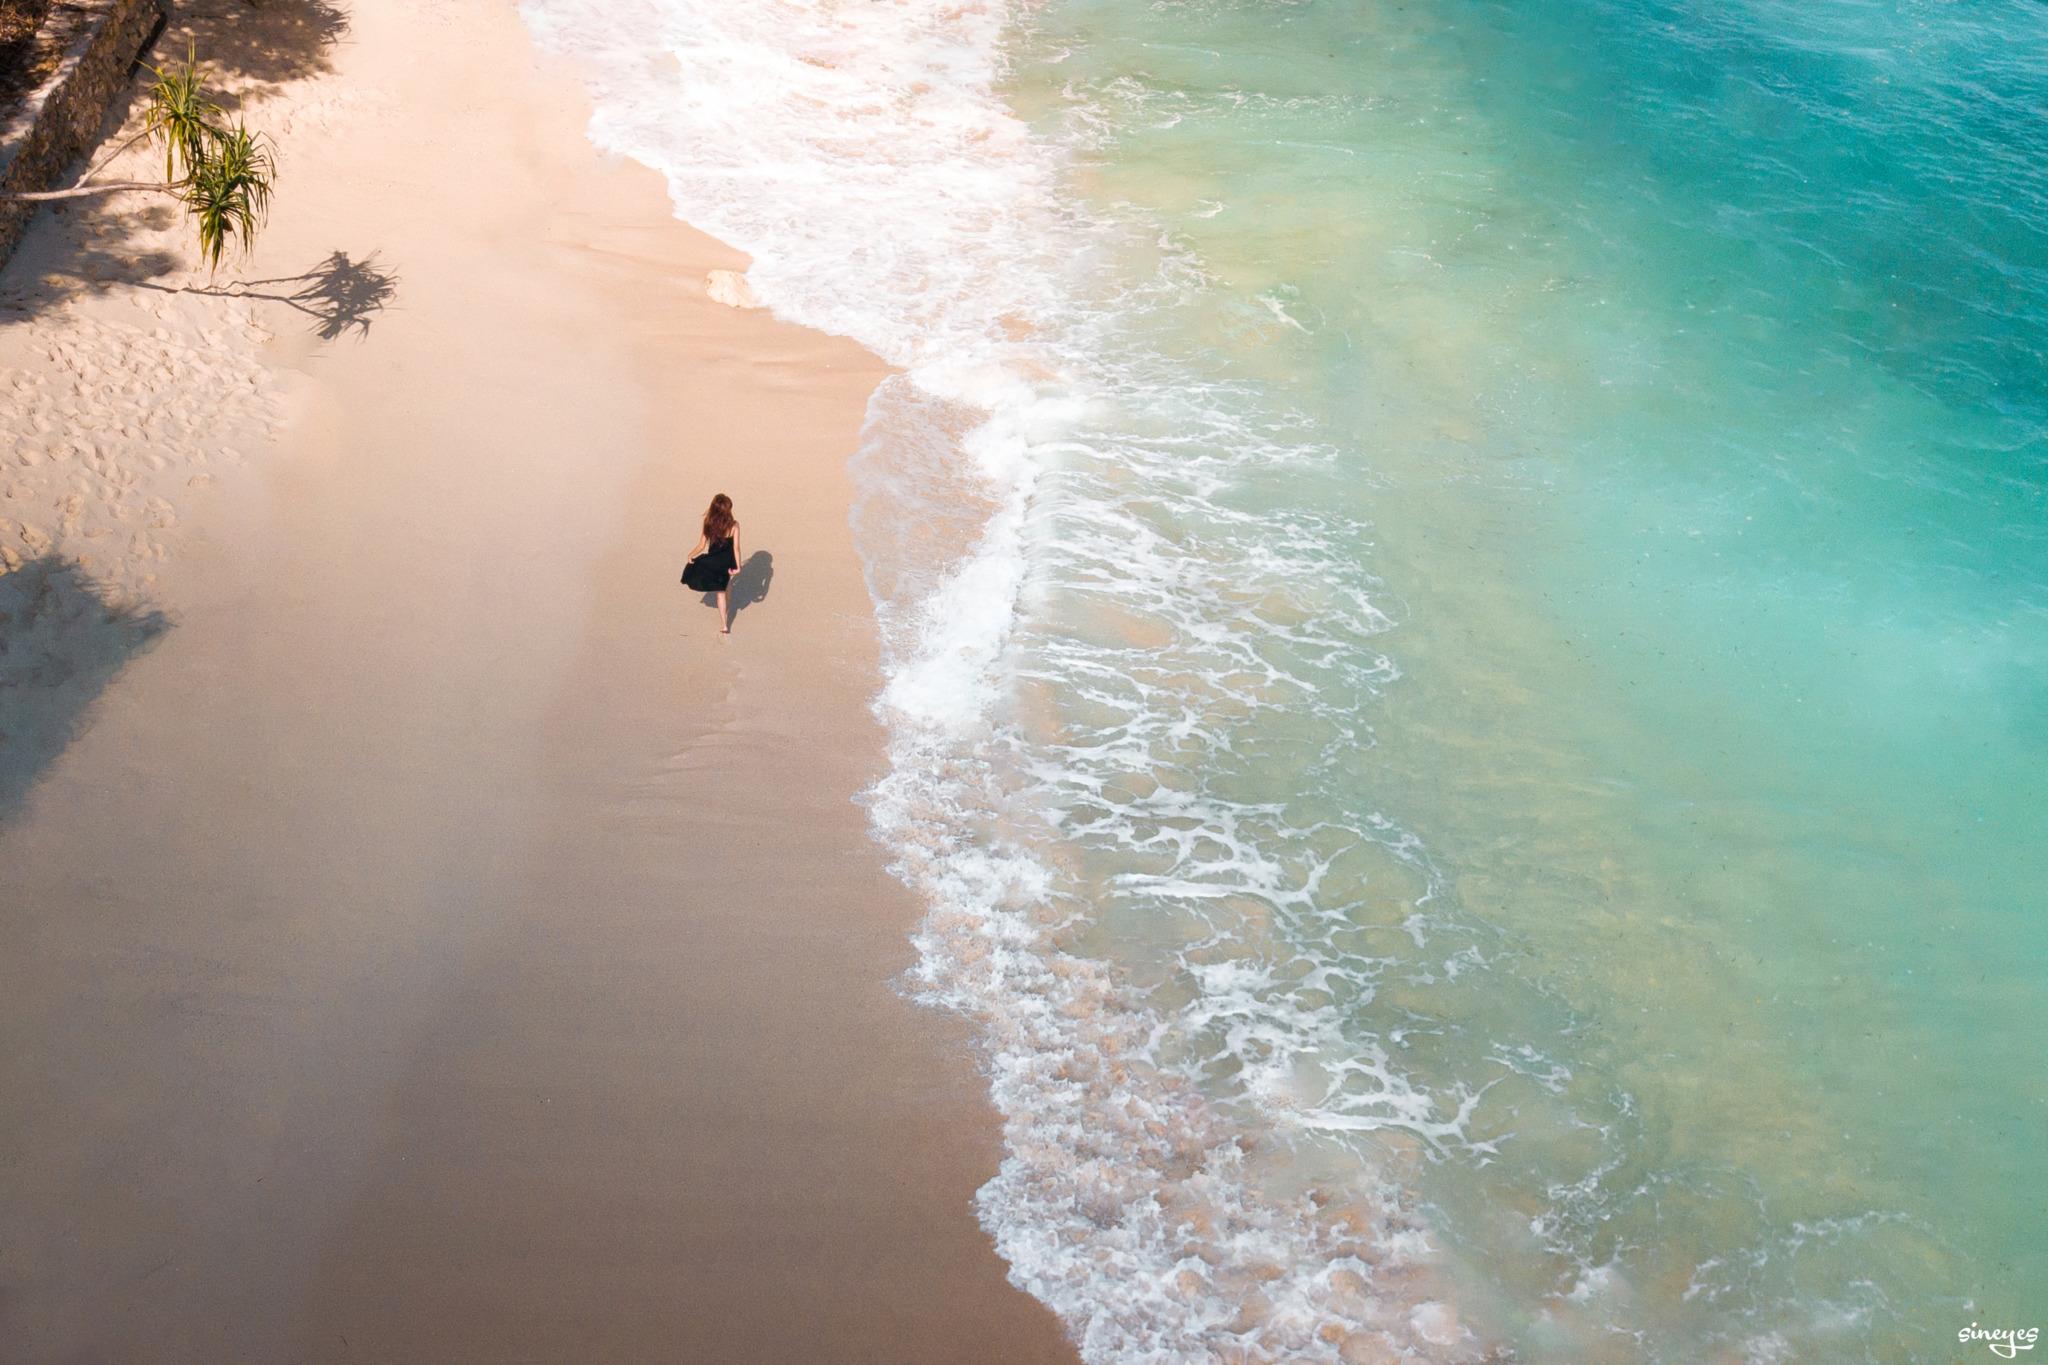 Walking beach by sineyes